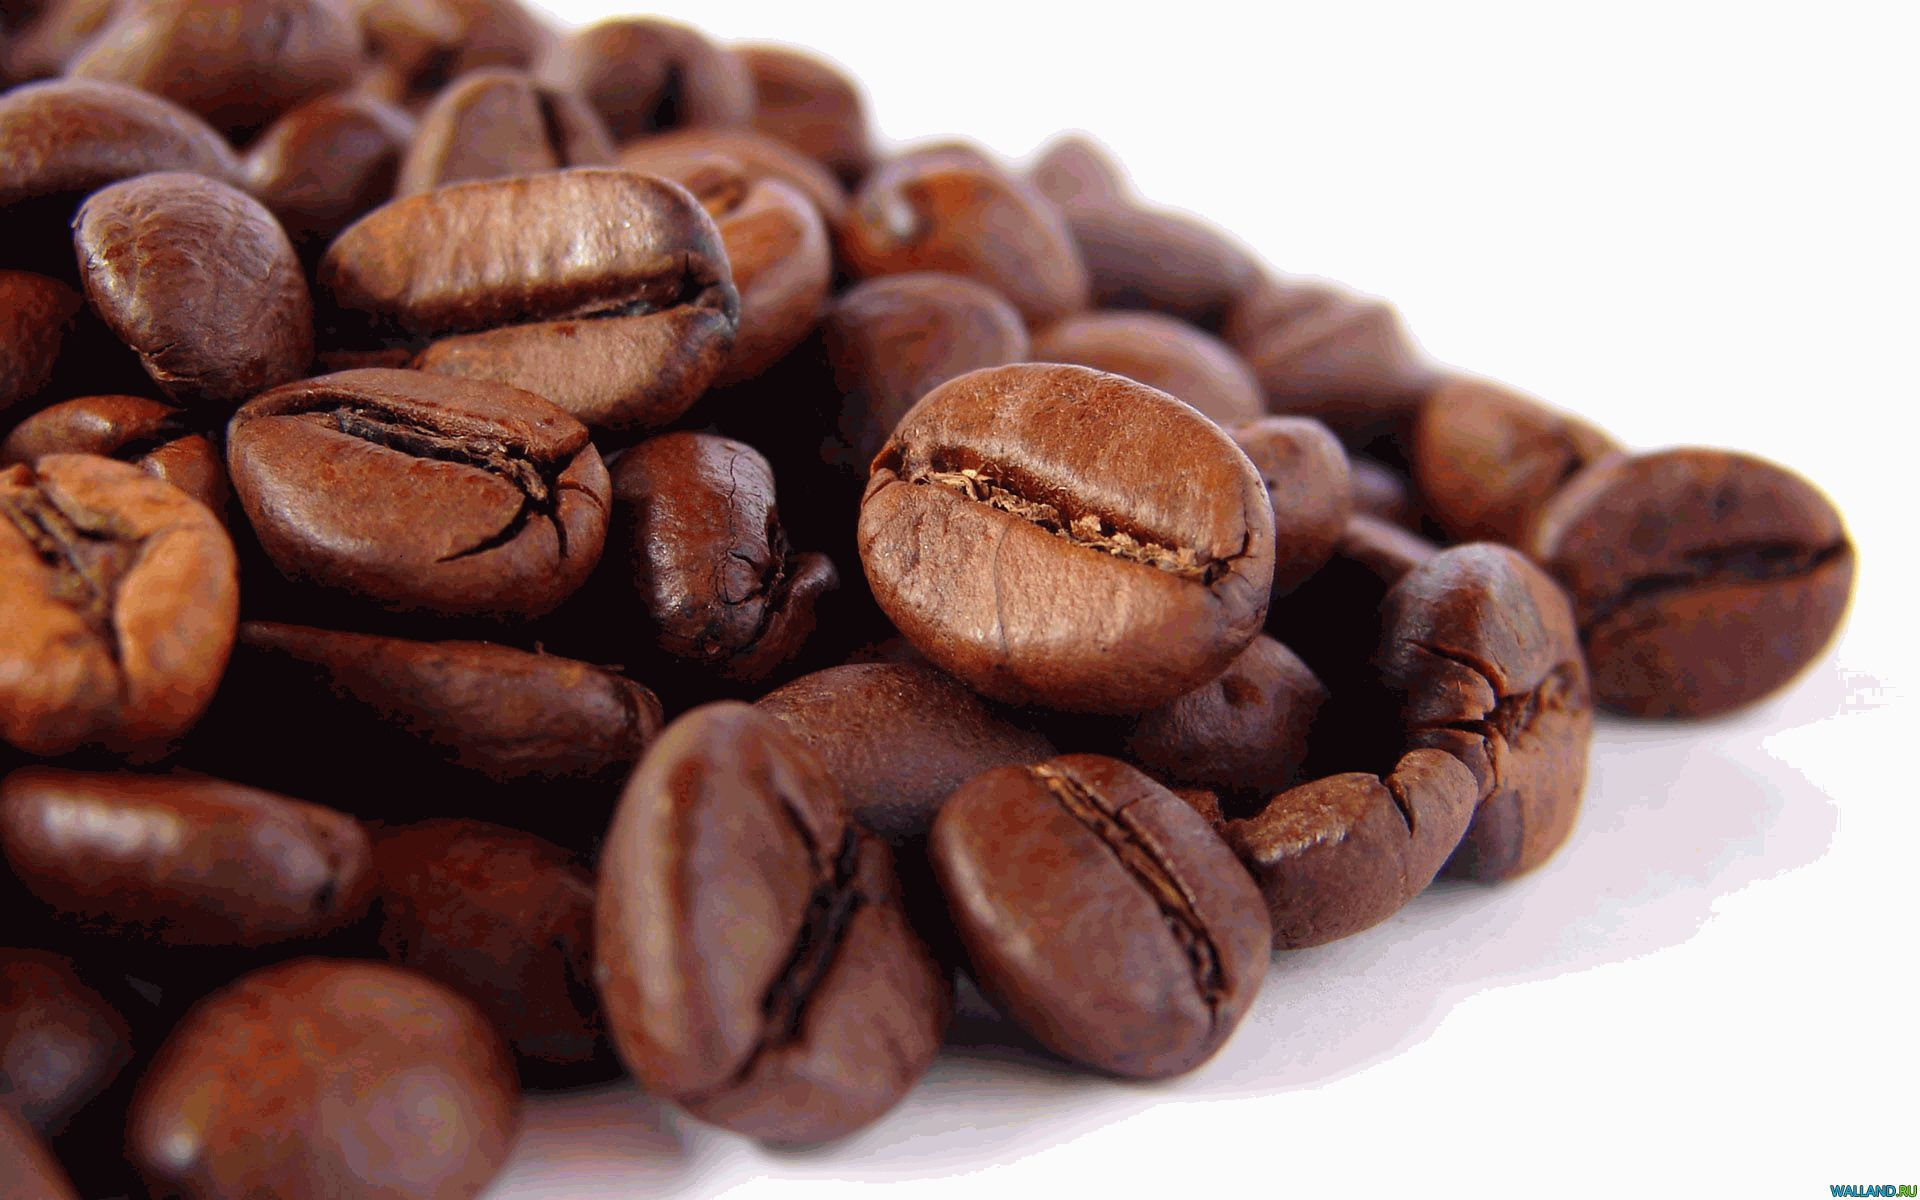 кофе,уход за лицом